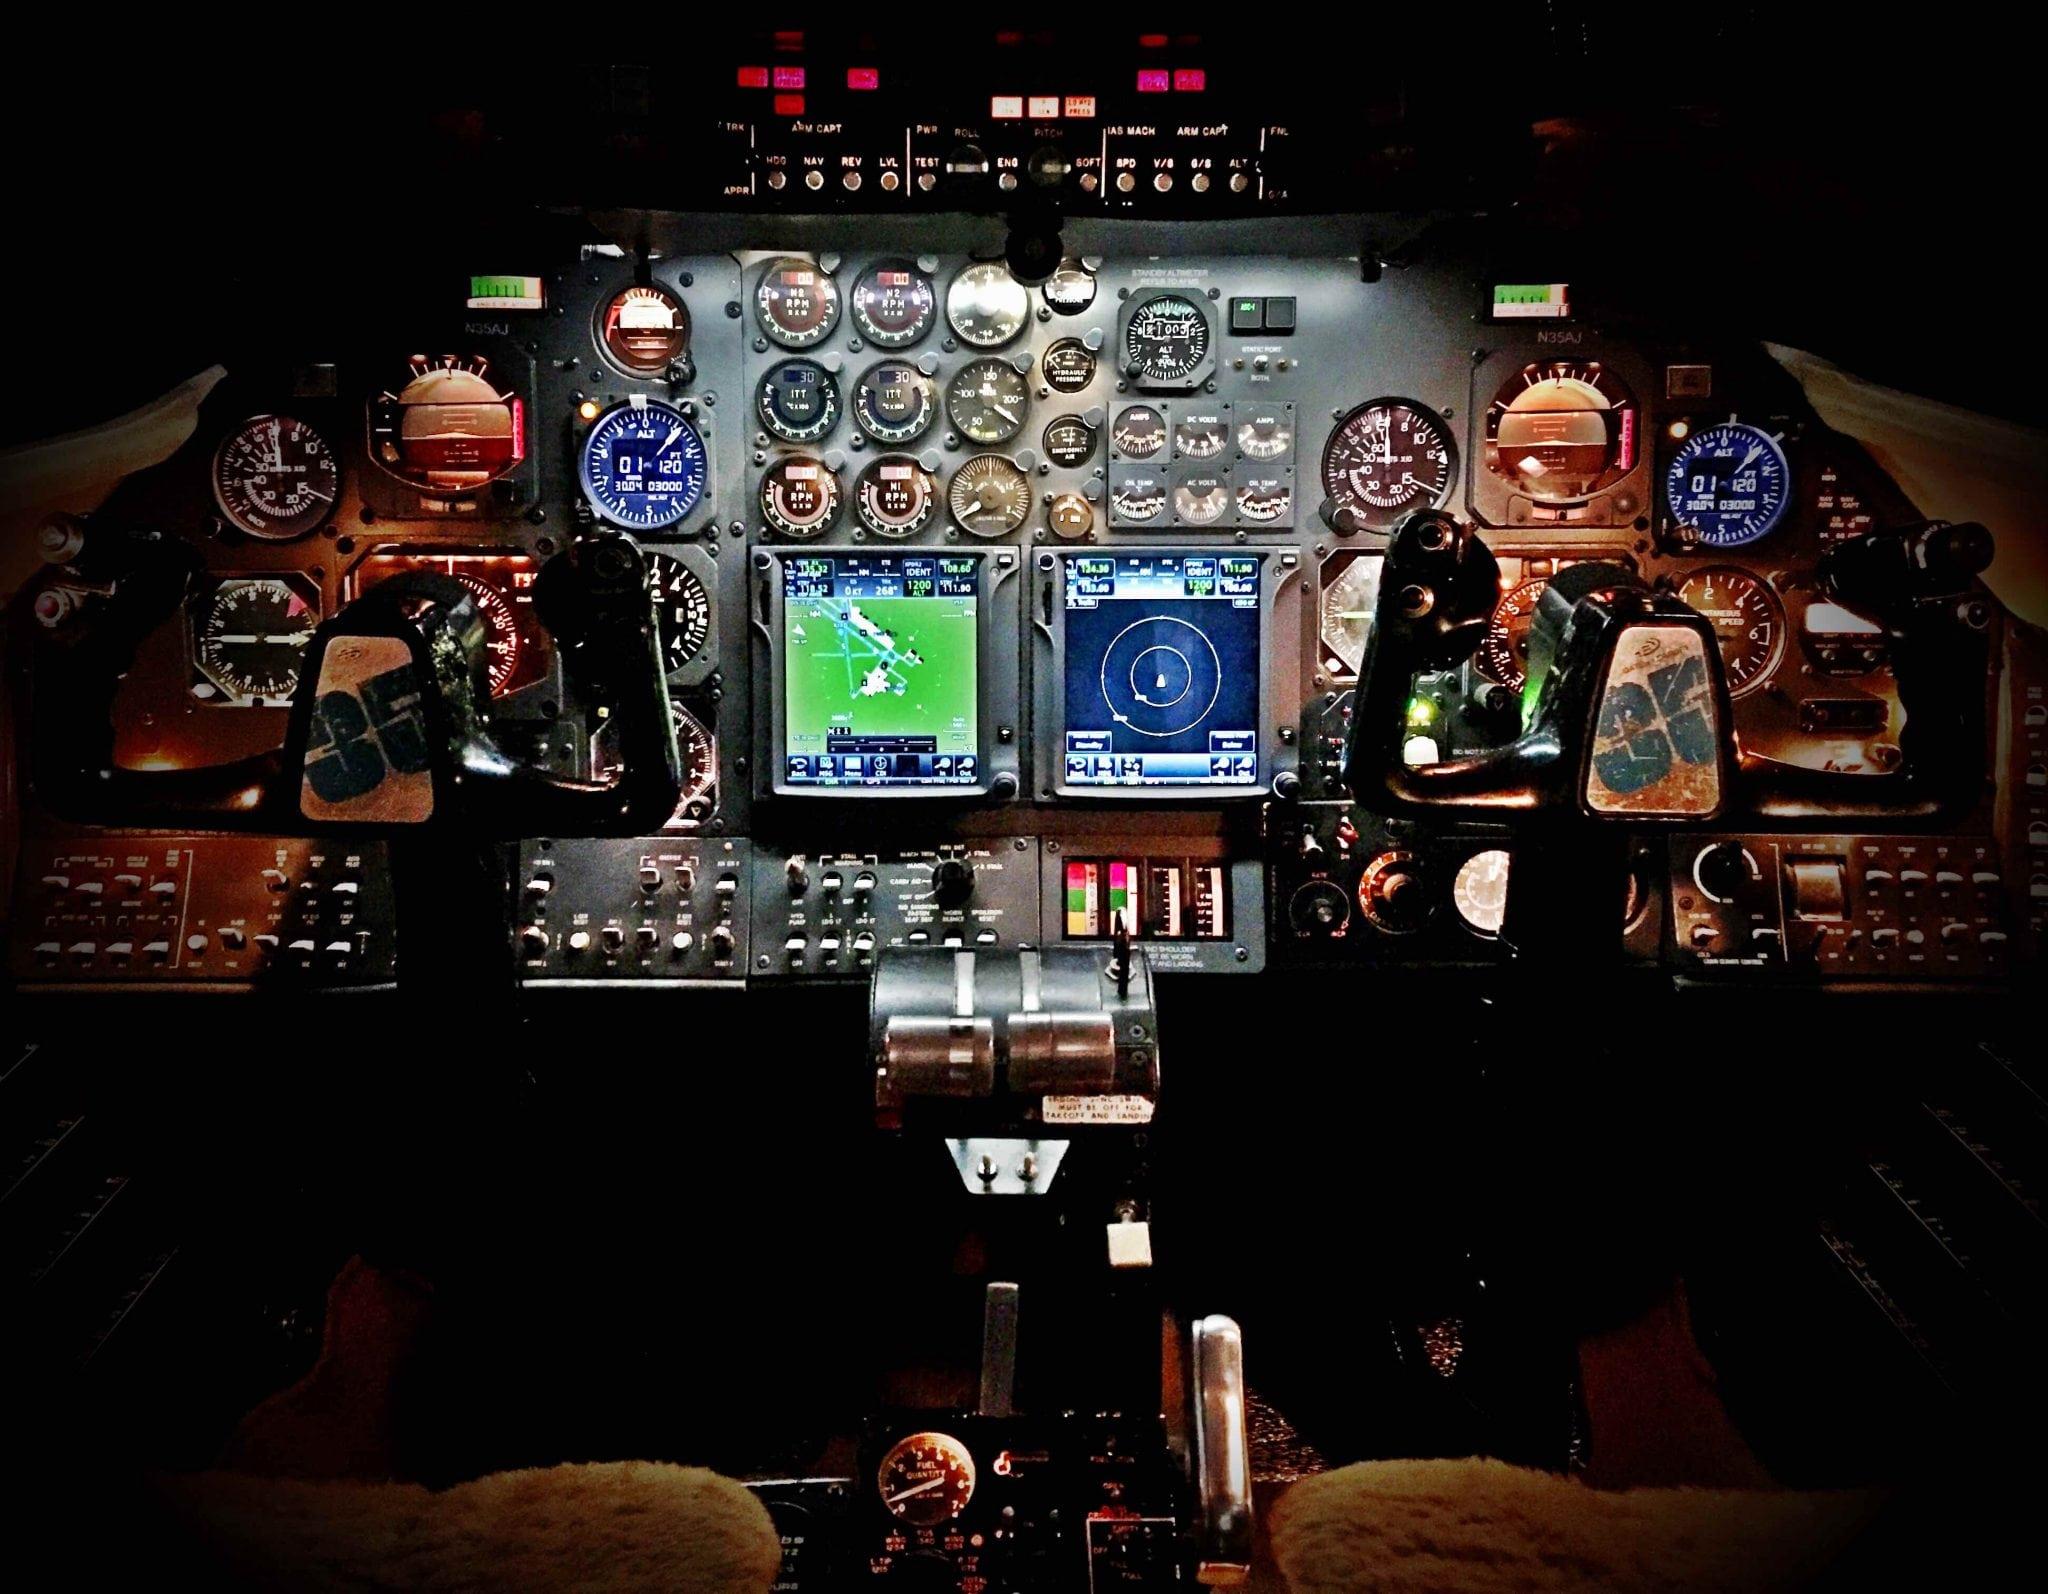 Butler Avionics ADS-B solution in Learjet cockpit